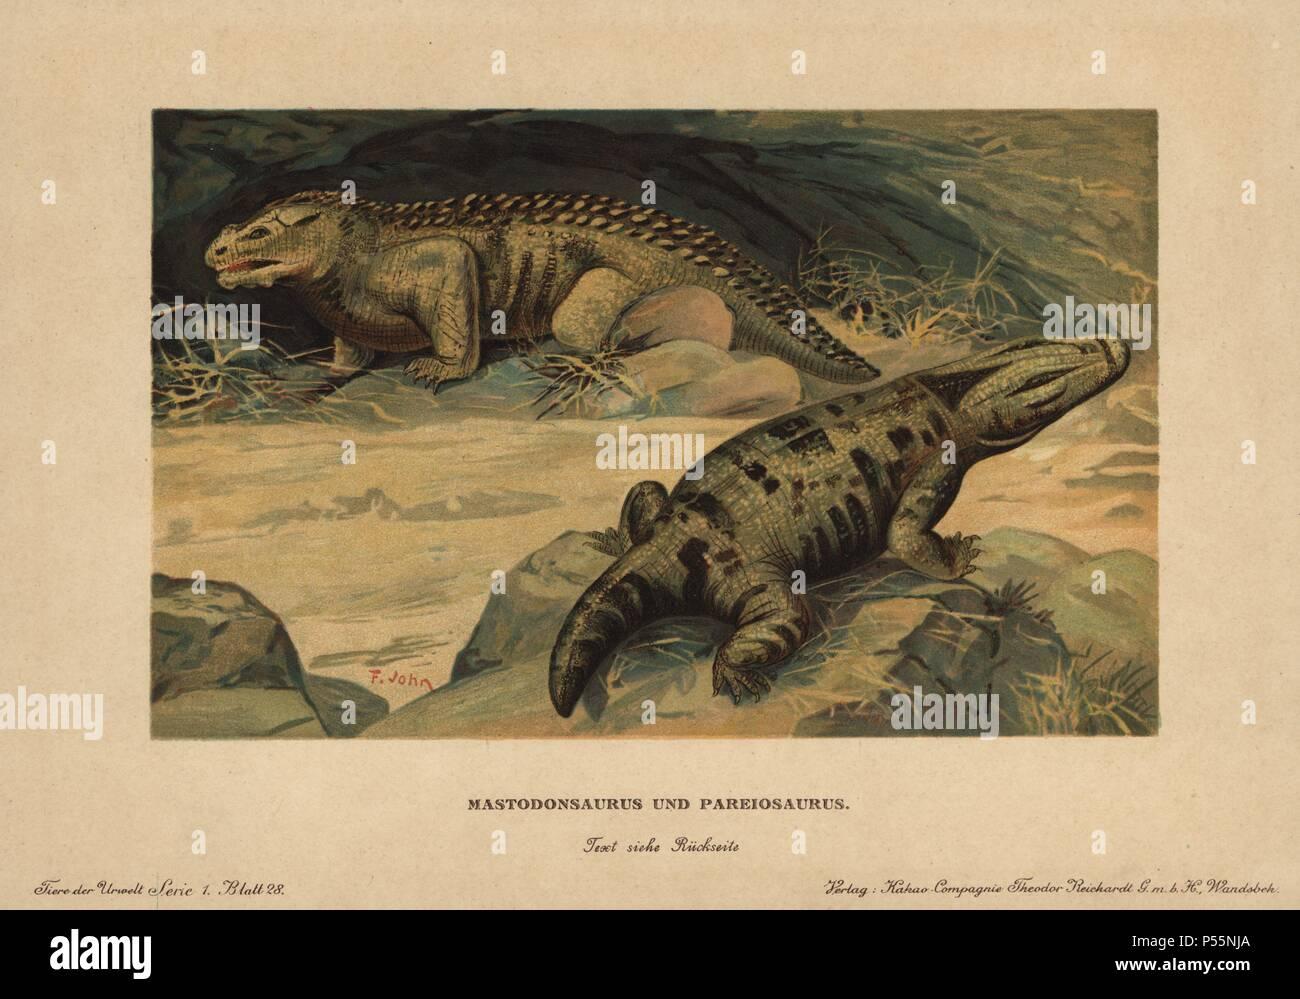 Mastodonsaurus, extinct genus of giant large-headed